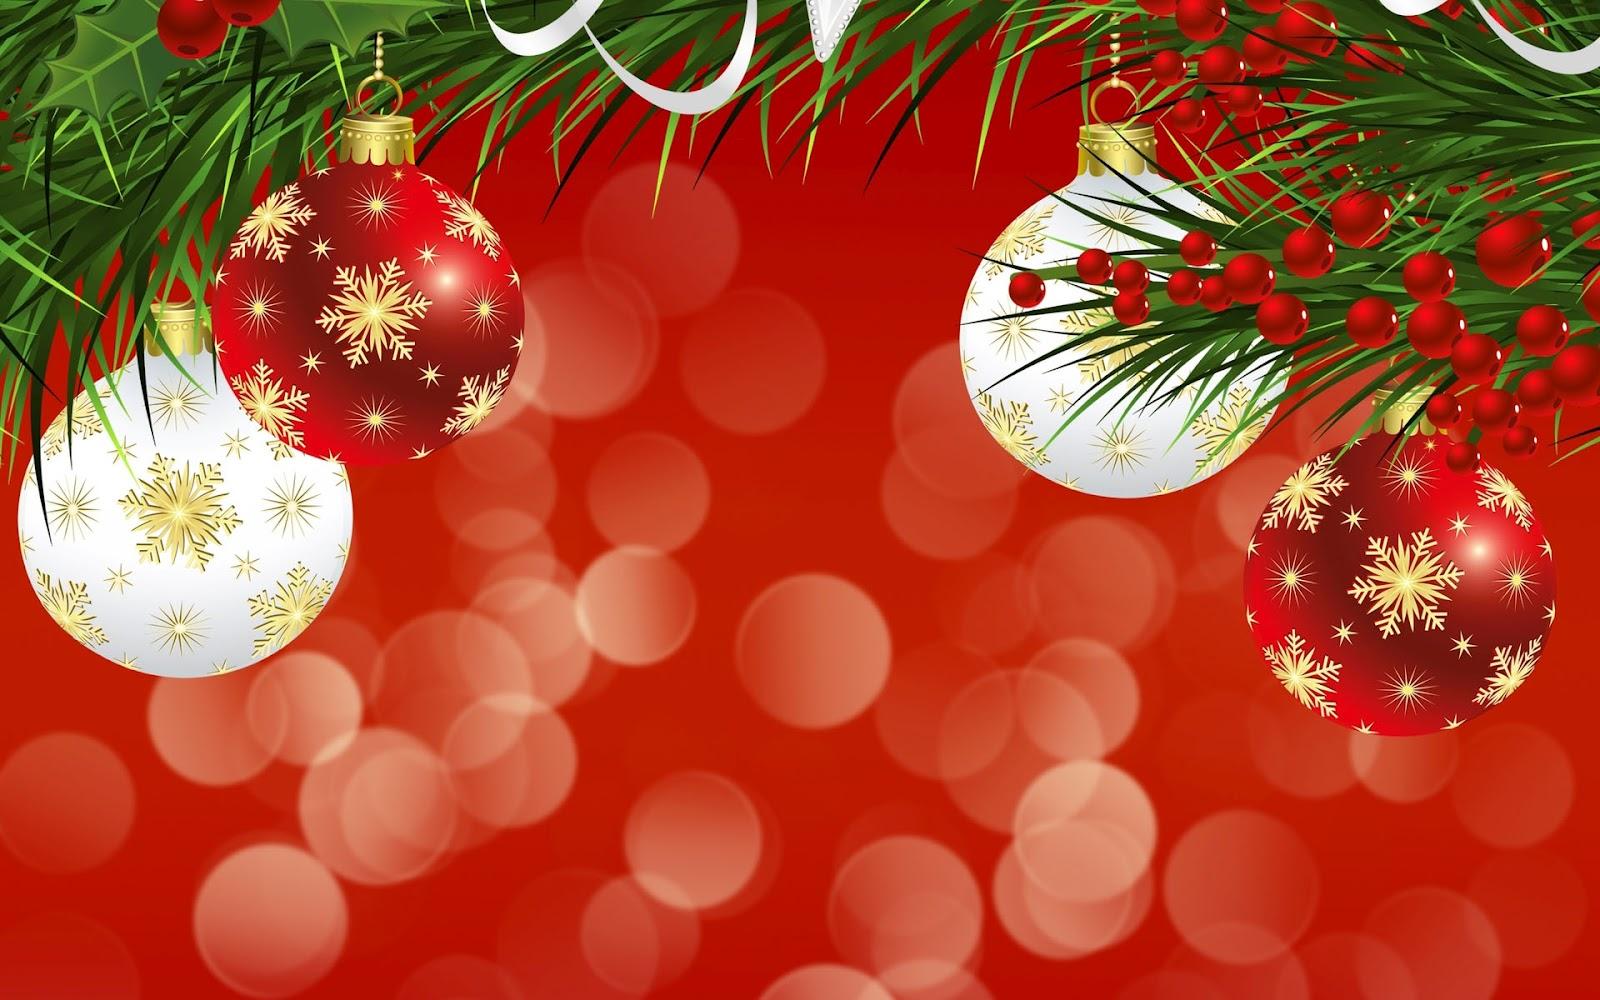 http://2.bp.blogspot.com/-N_yyzmQLUgc/UFHruSaGweI/AAAAAAAAHj8/eFtP1vAz4Fg/s1600/hd-kerst-achtergrond-met-rode-en-witte-3d-kerstballen-wallpaper.jpg